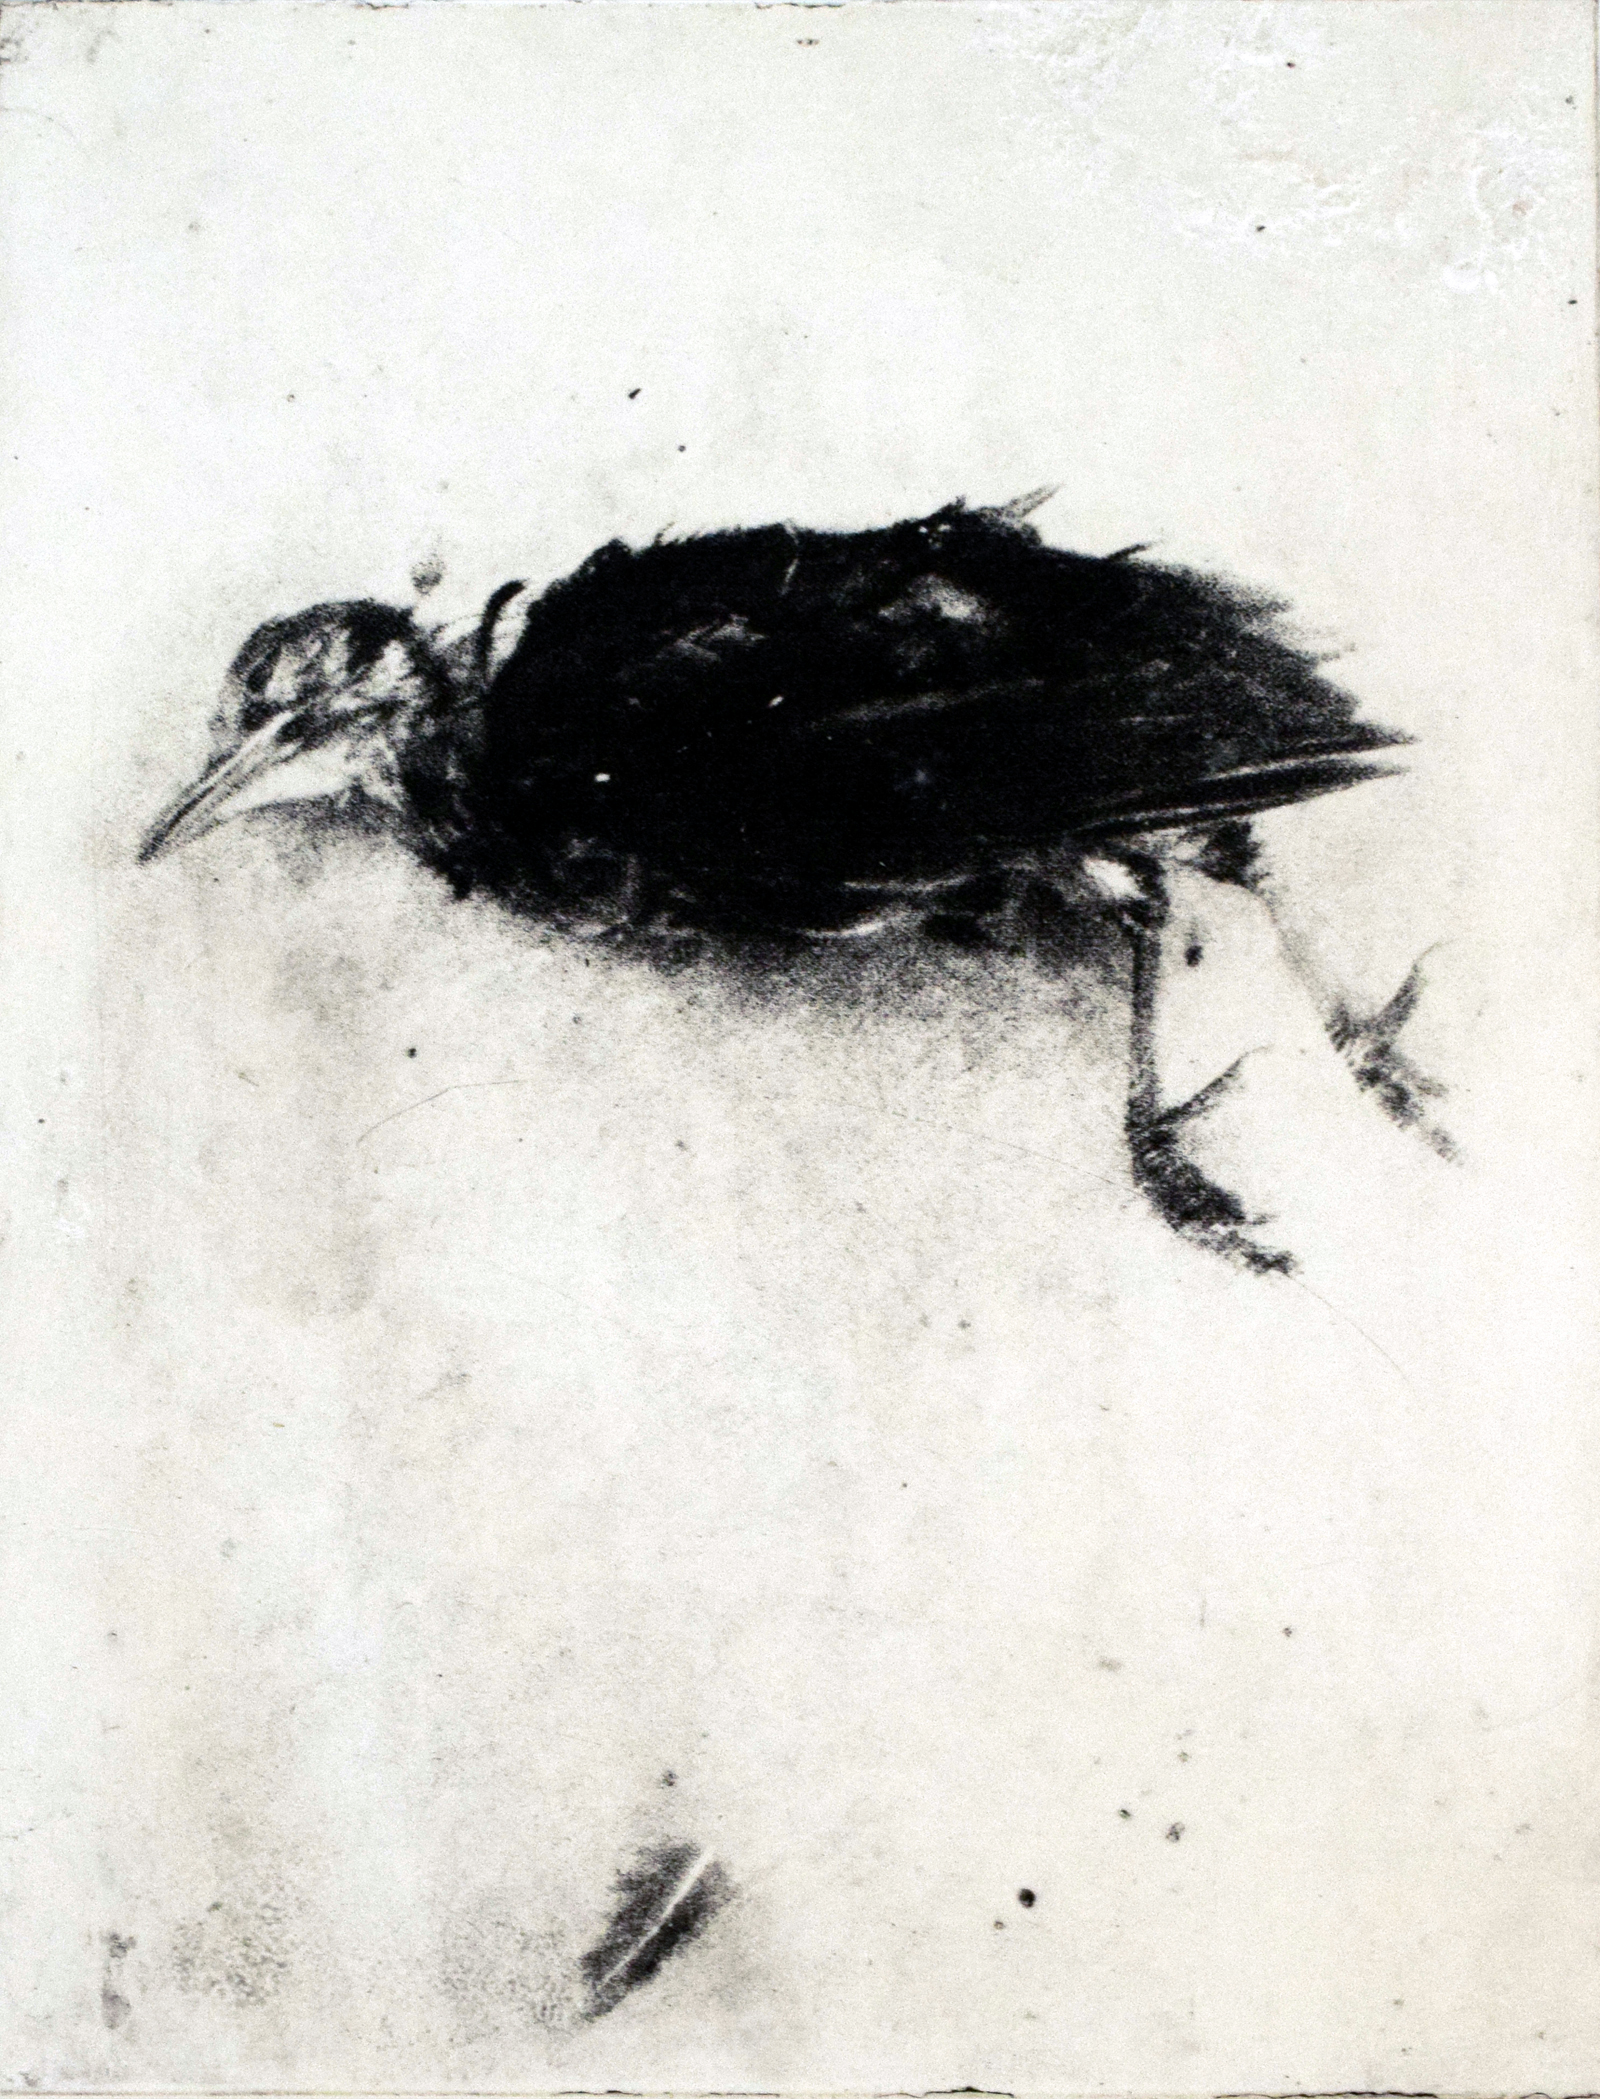 Dood vogeltje vliegt weg